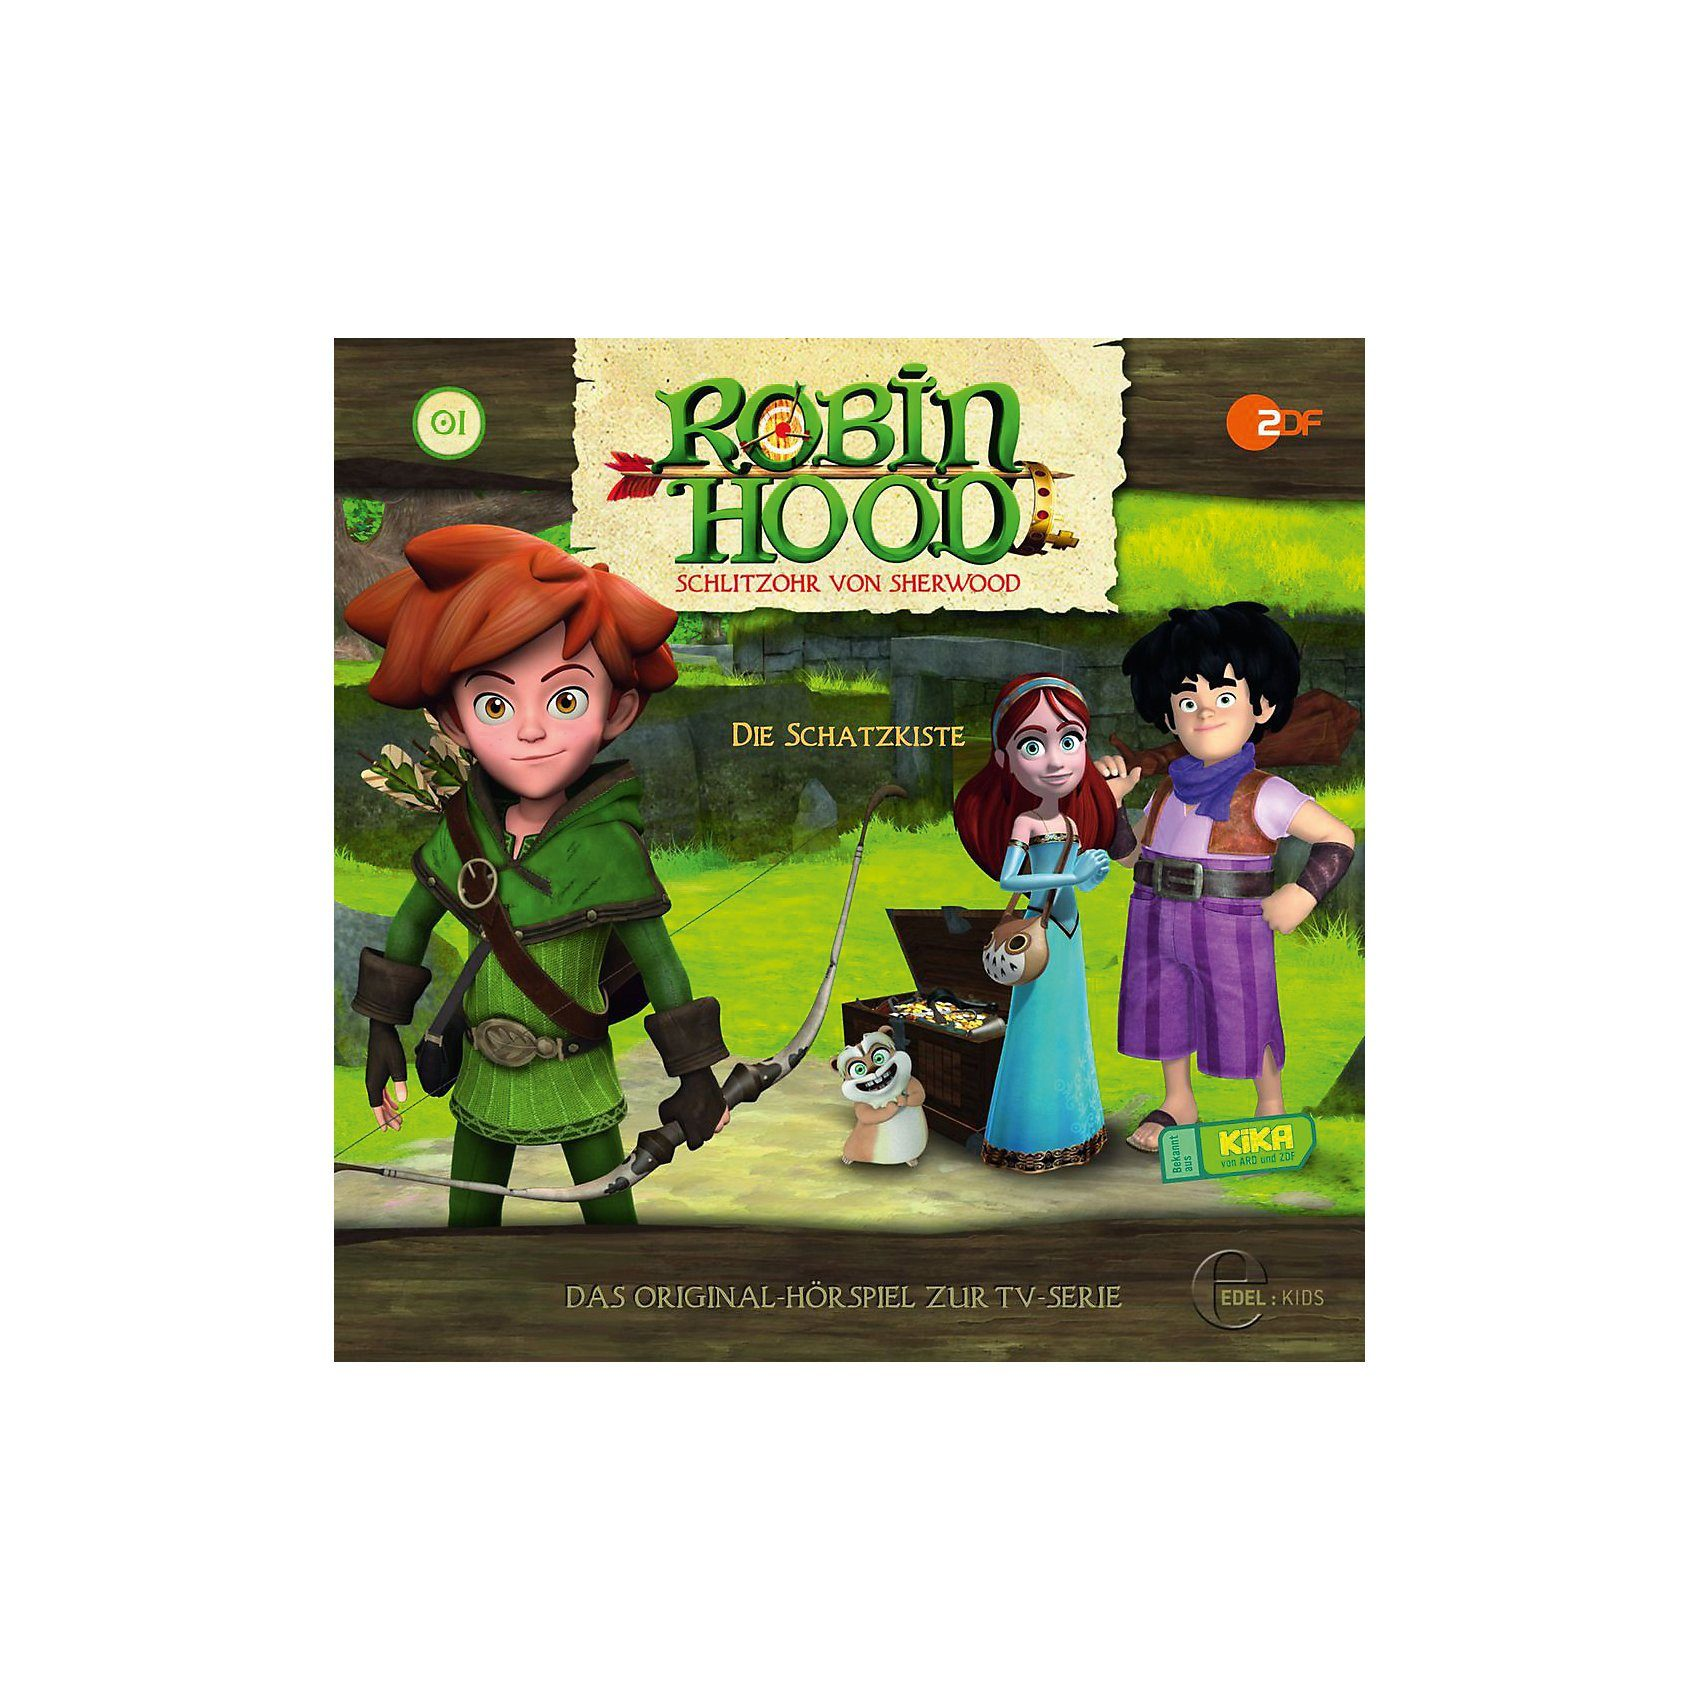 Edel CD Robin Hood 01 - Die Schatzkiste